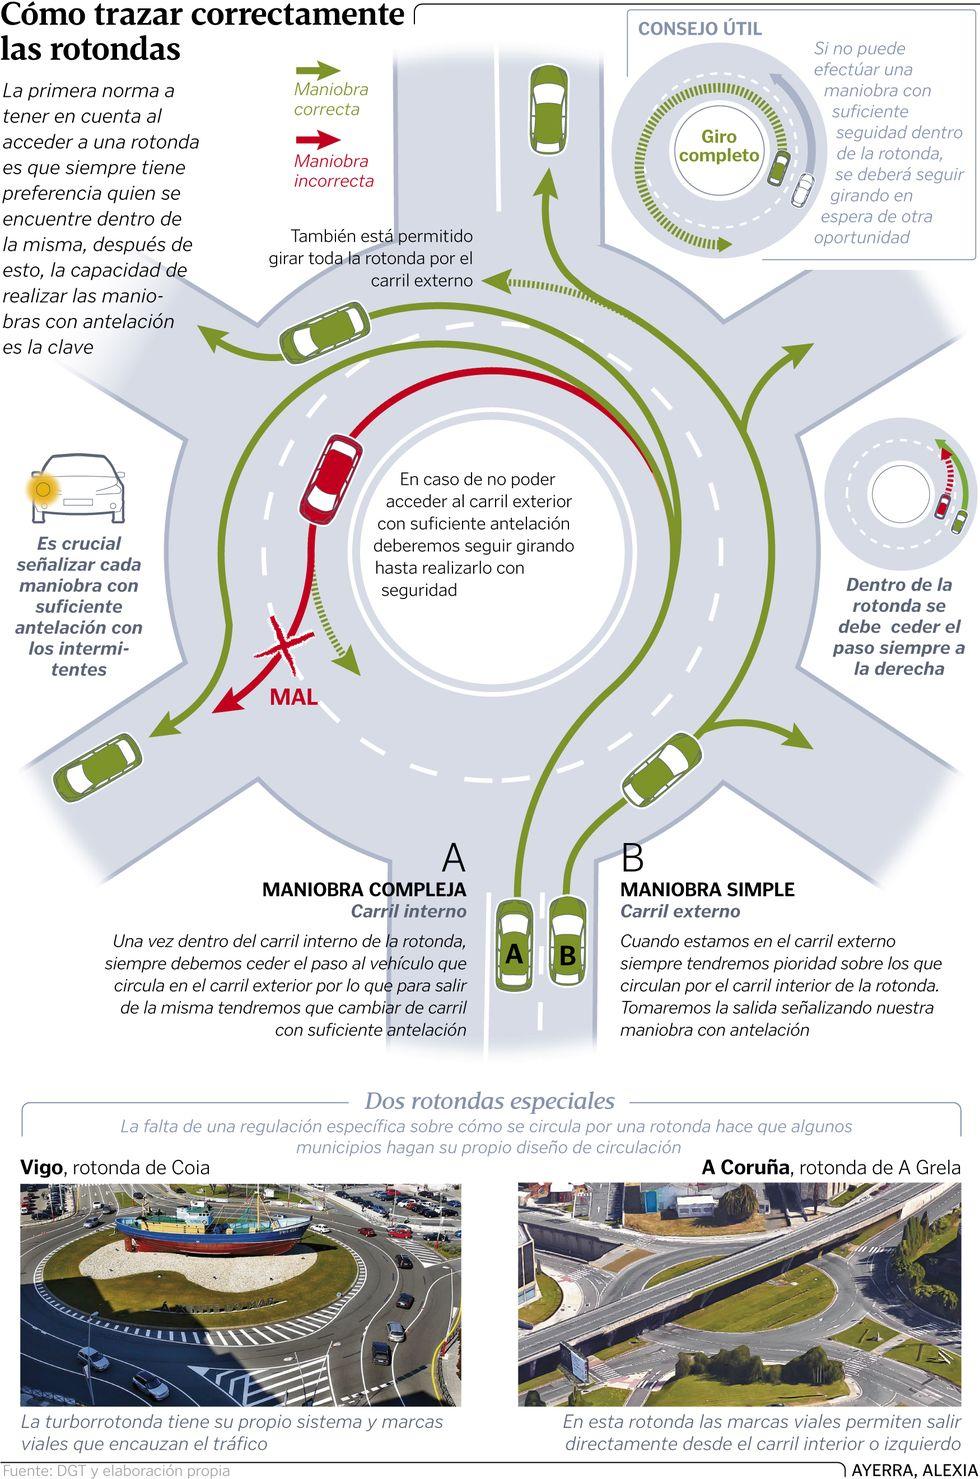 Cómo trazar correctamente las rotondas | Otomobil | Pinterest ...